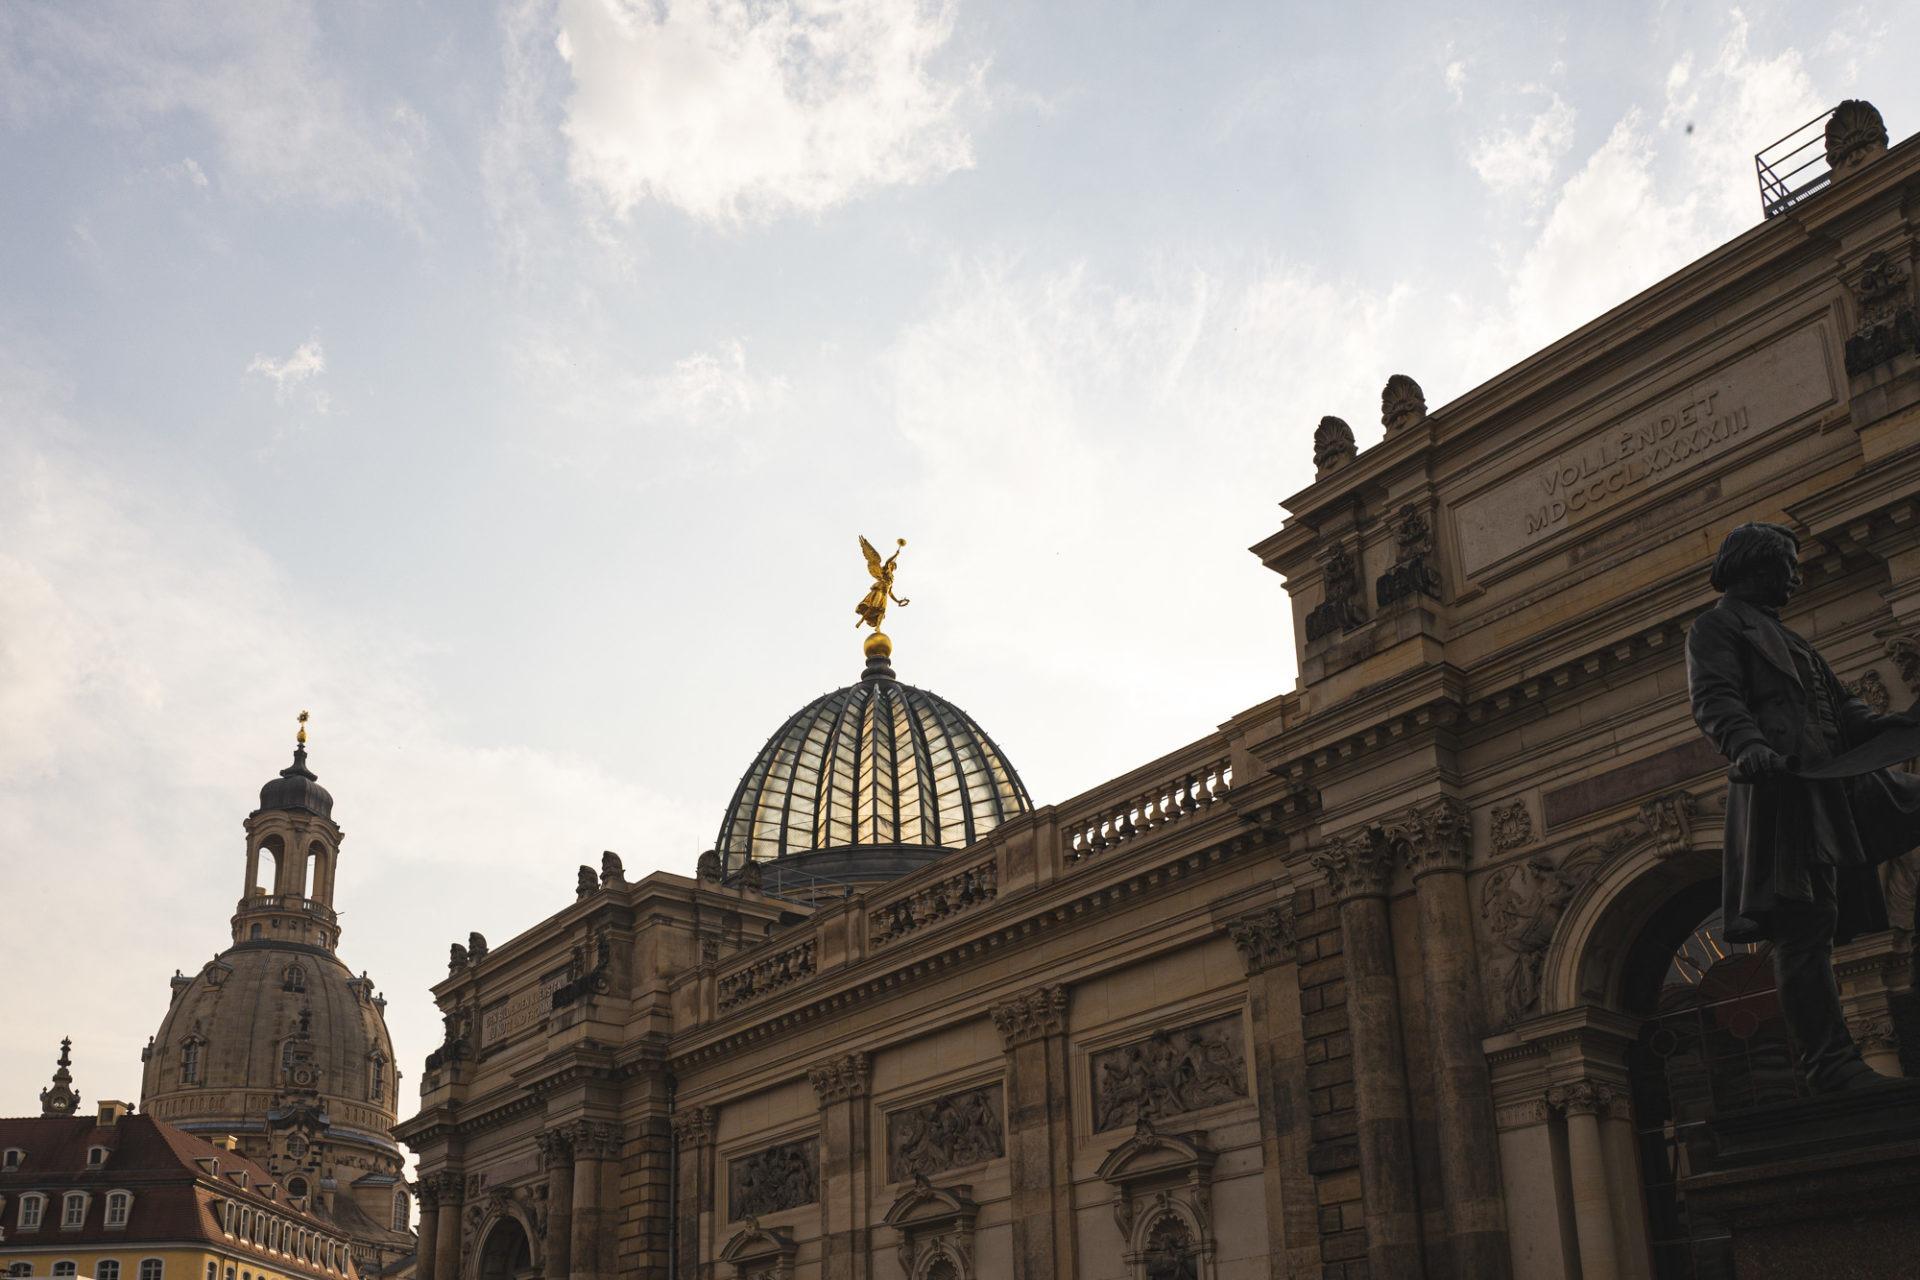 Nomos Glashütte - Dresden